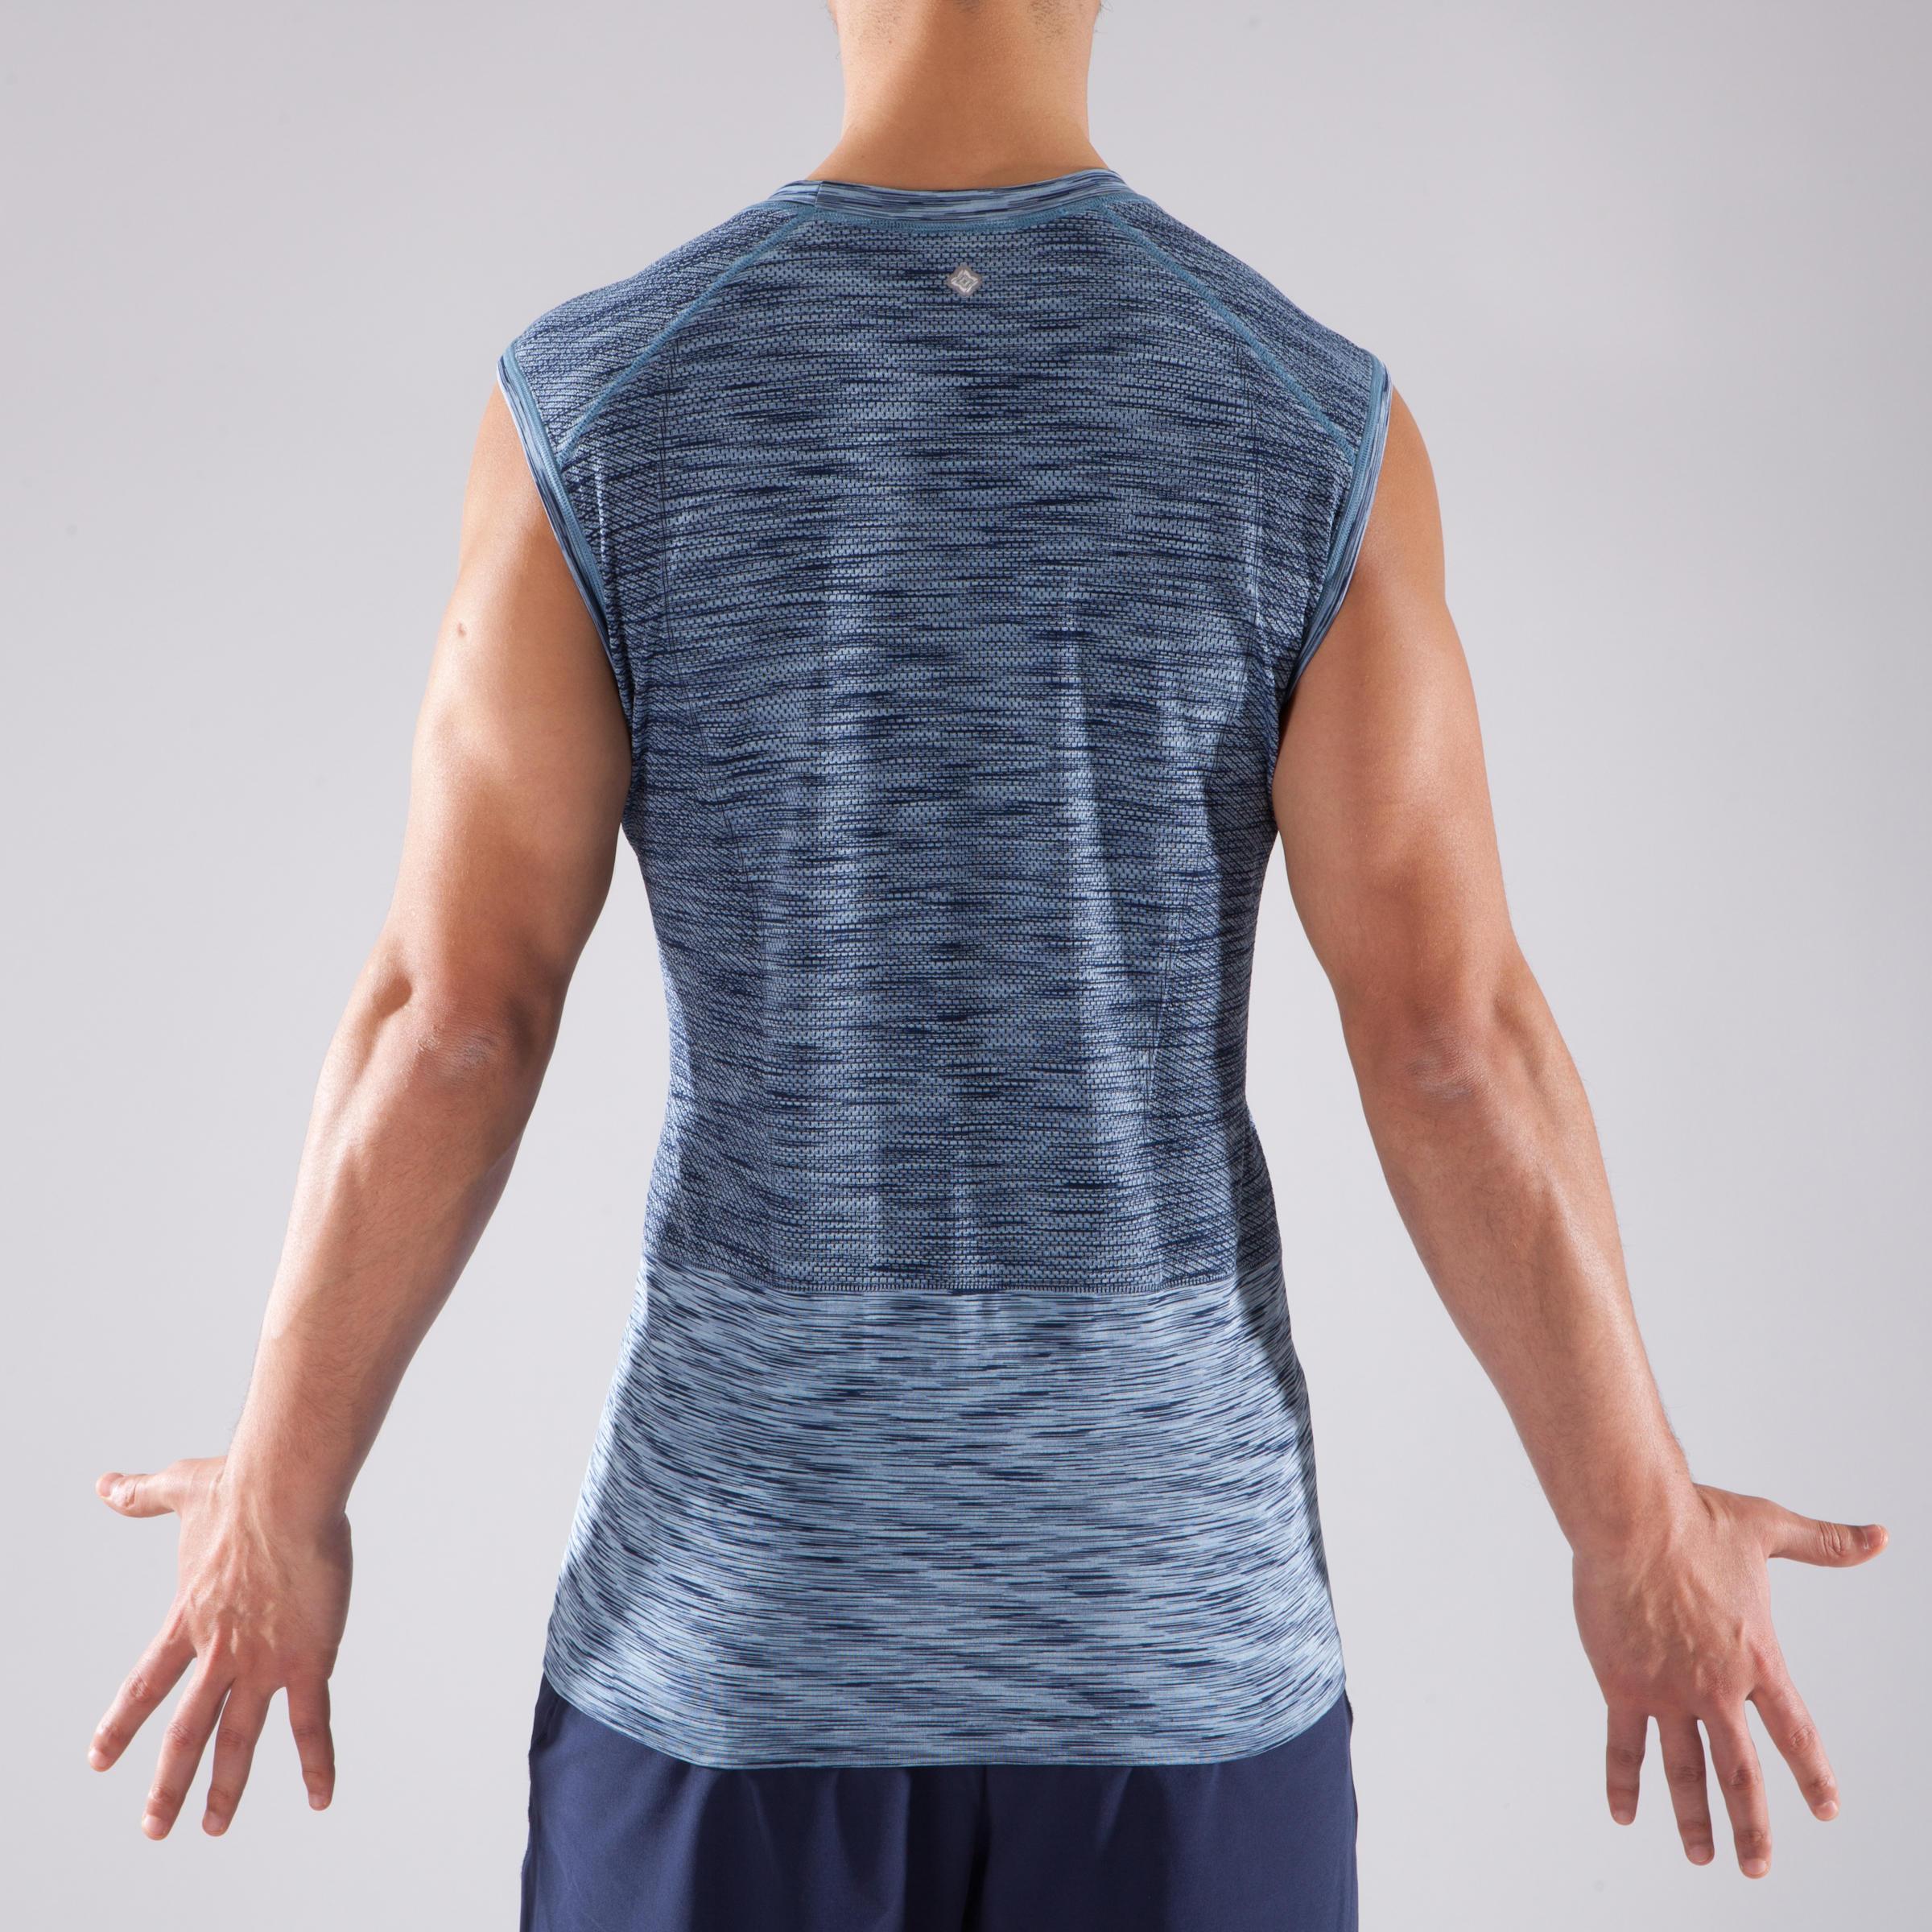 Seamless Yoga Tank Top - Black/Blue